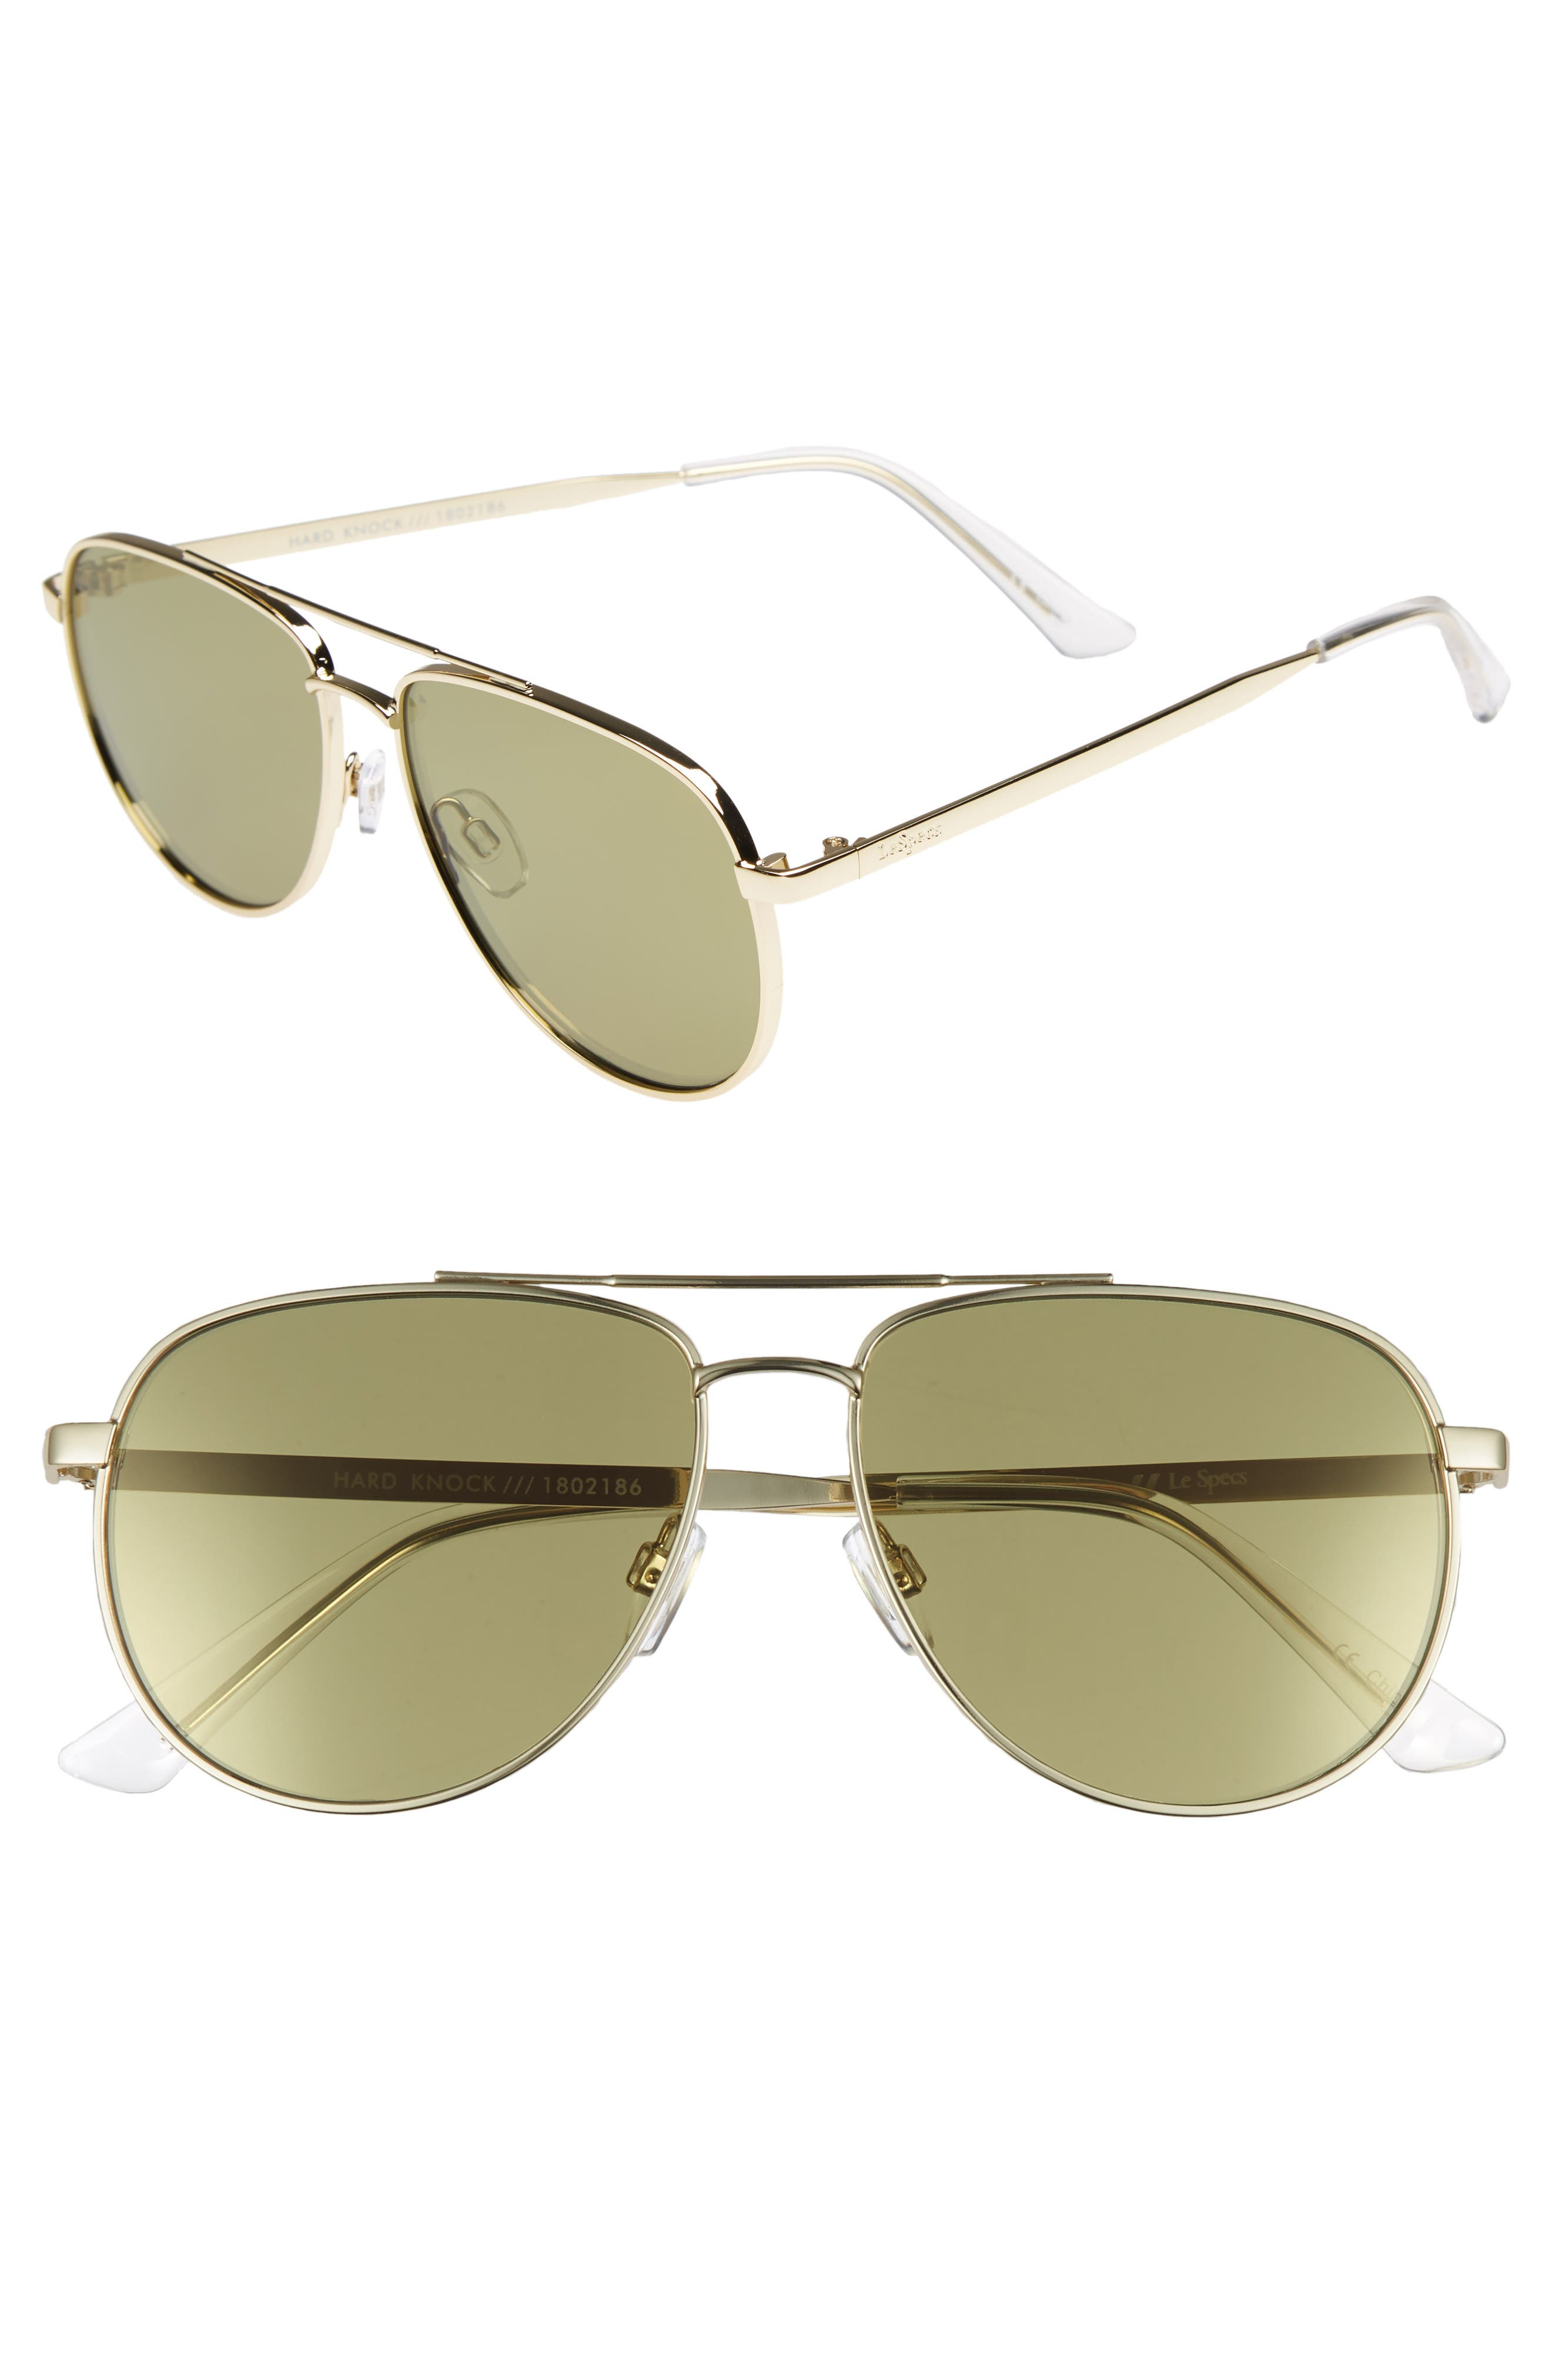 Le Specs Hard Knock 57Mm Aviator Sunglasses - Bright Gold